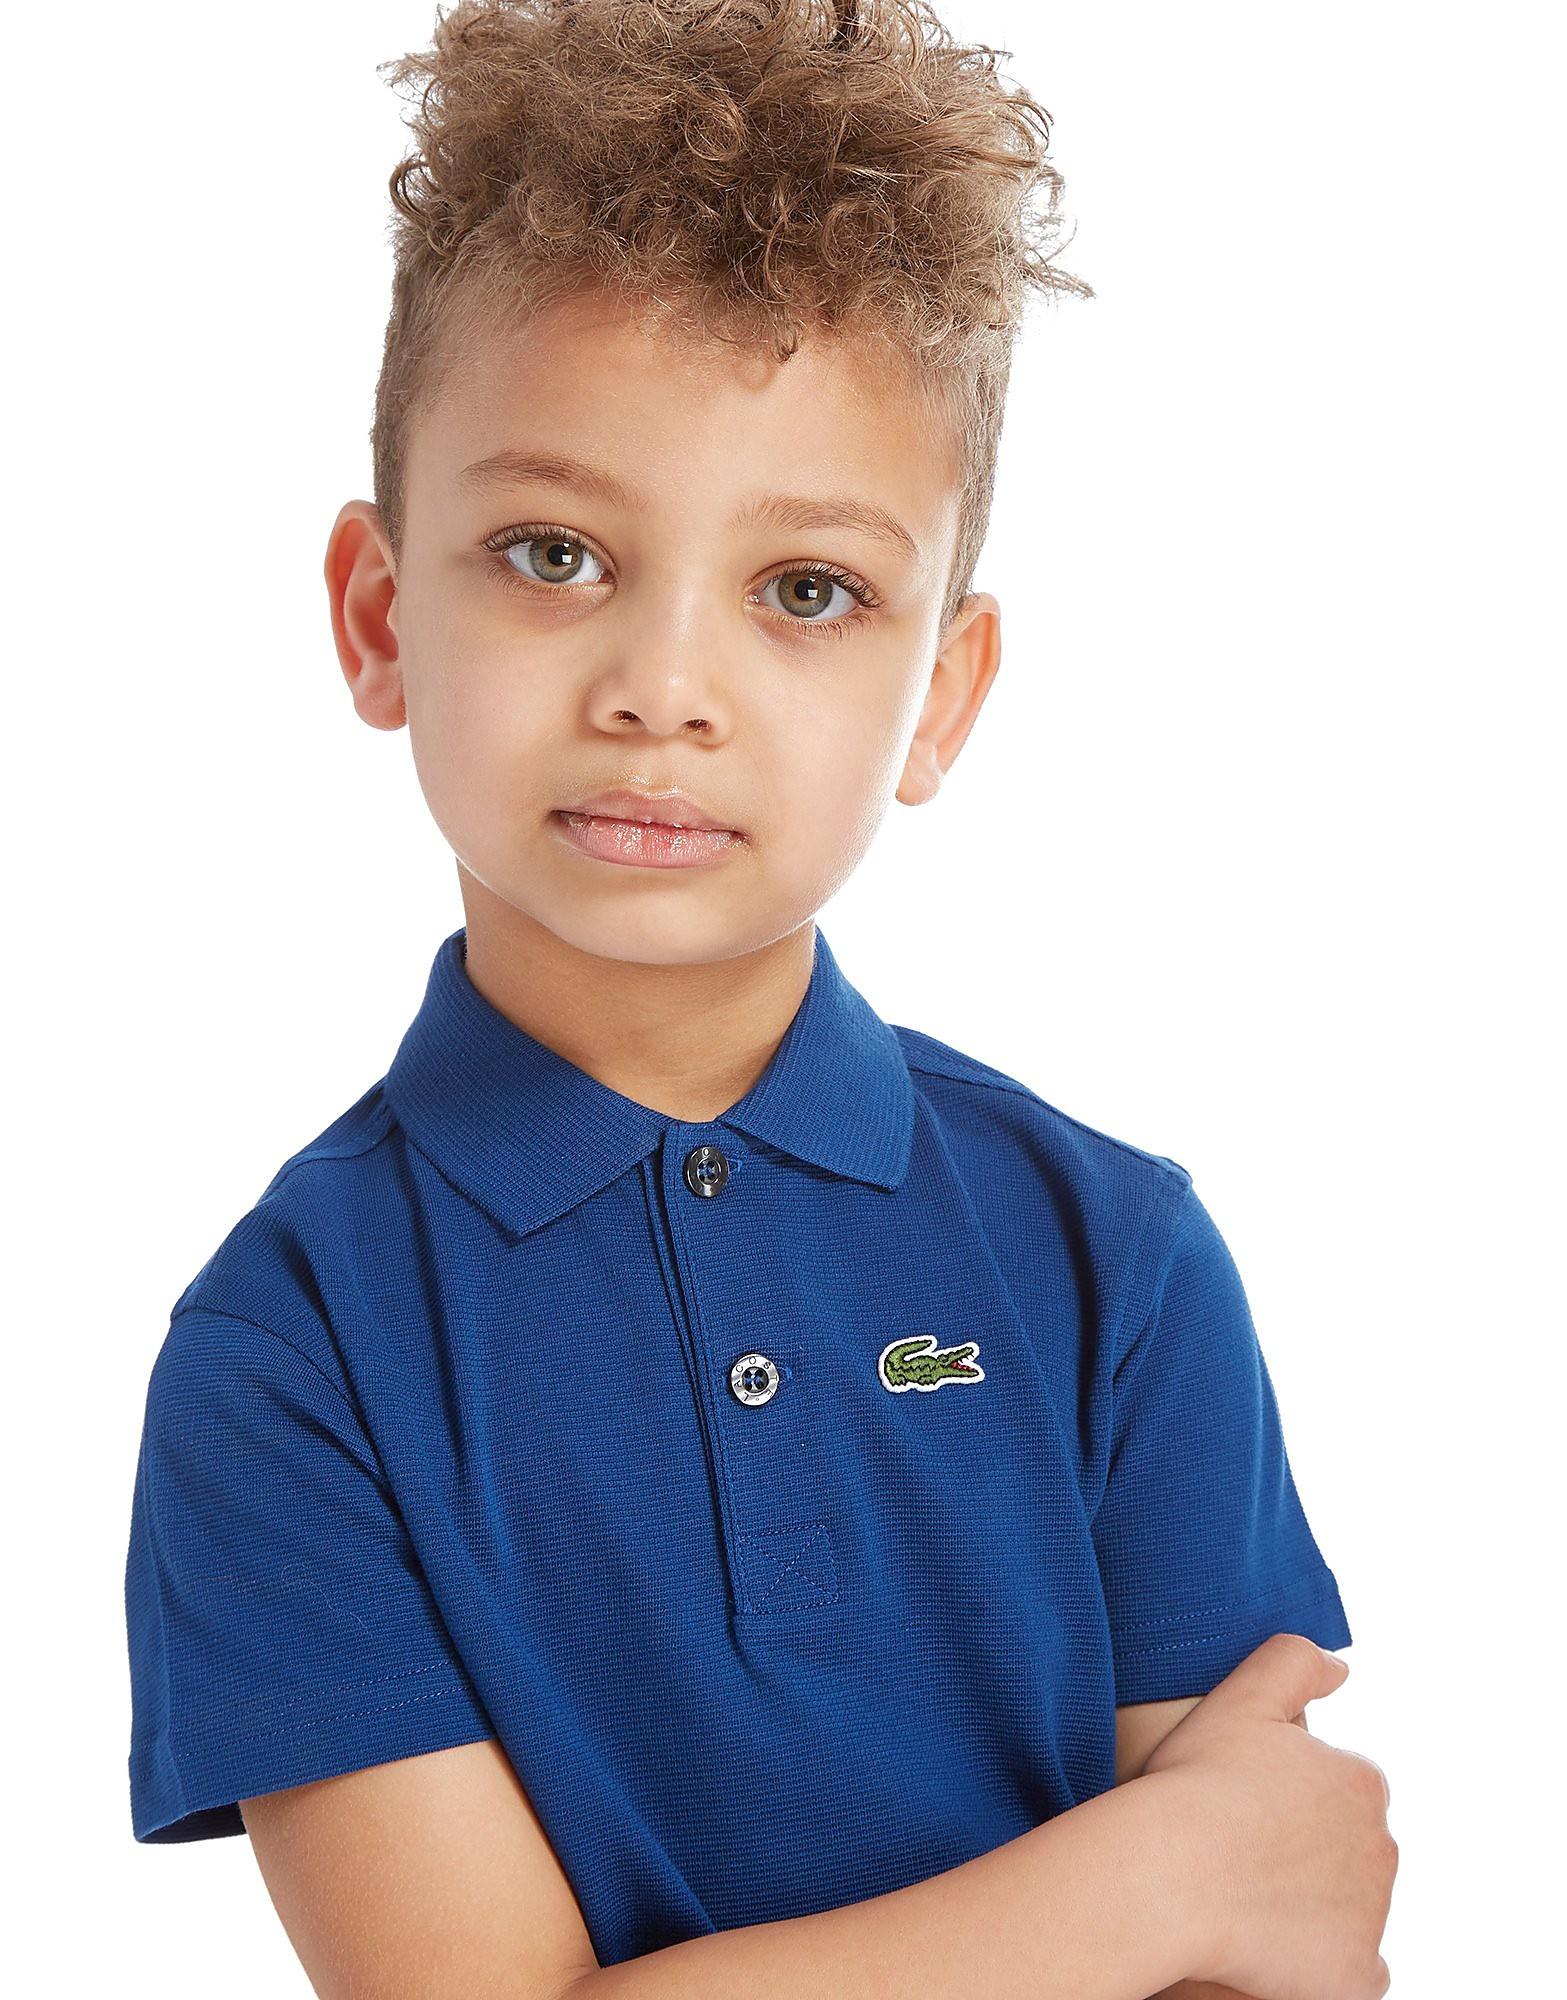 Lacoste Logo Polo Shirt Baby's - Blauw - Kind